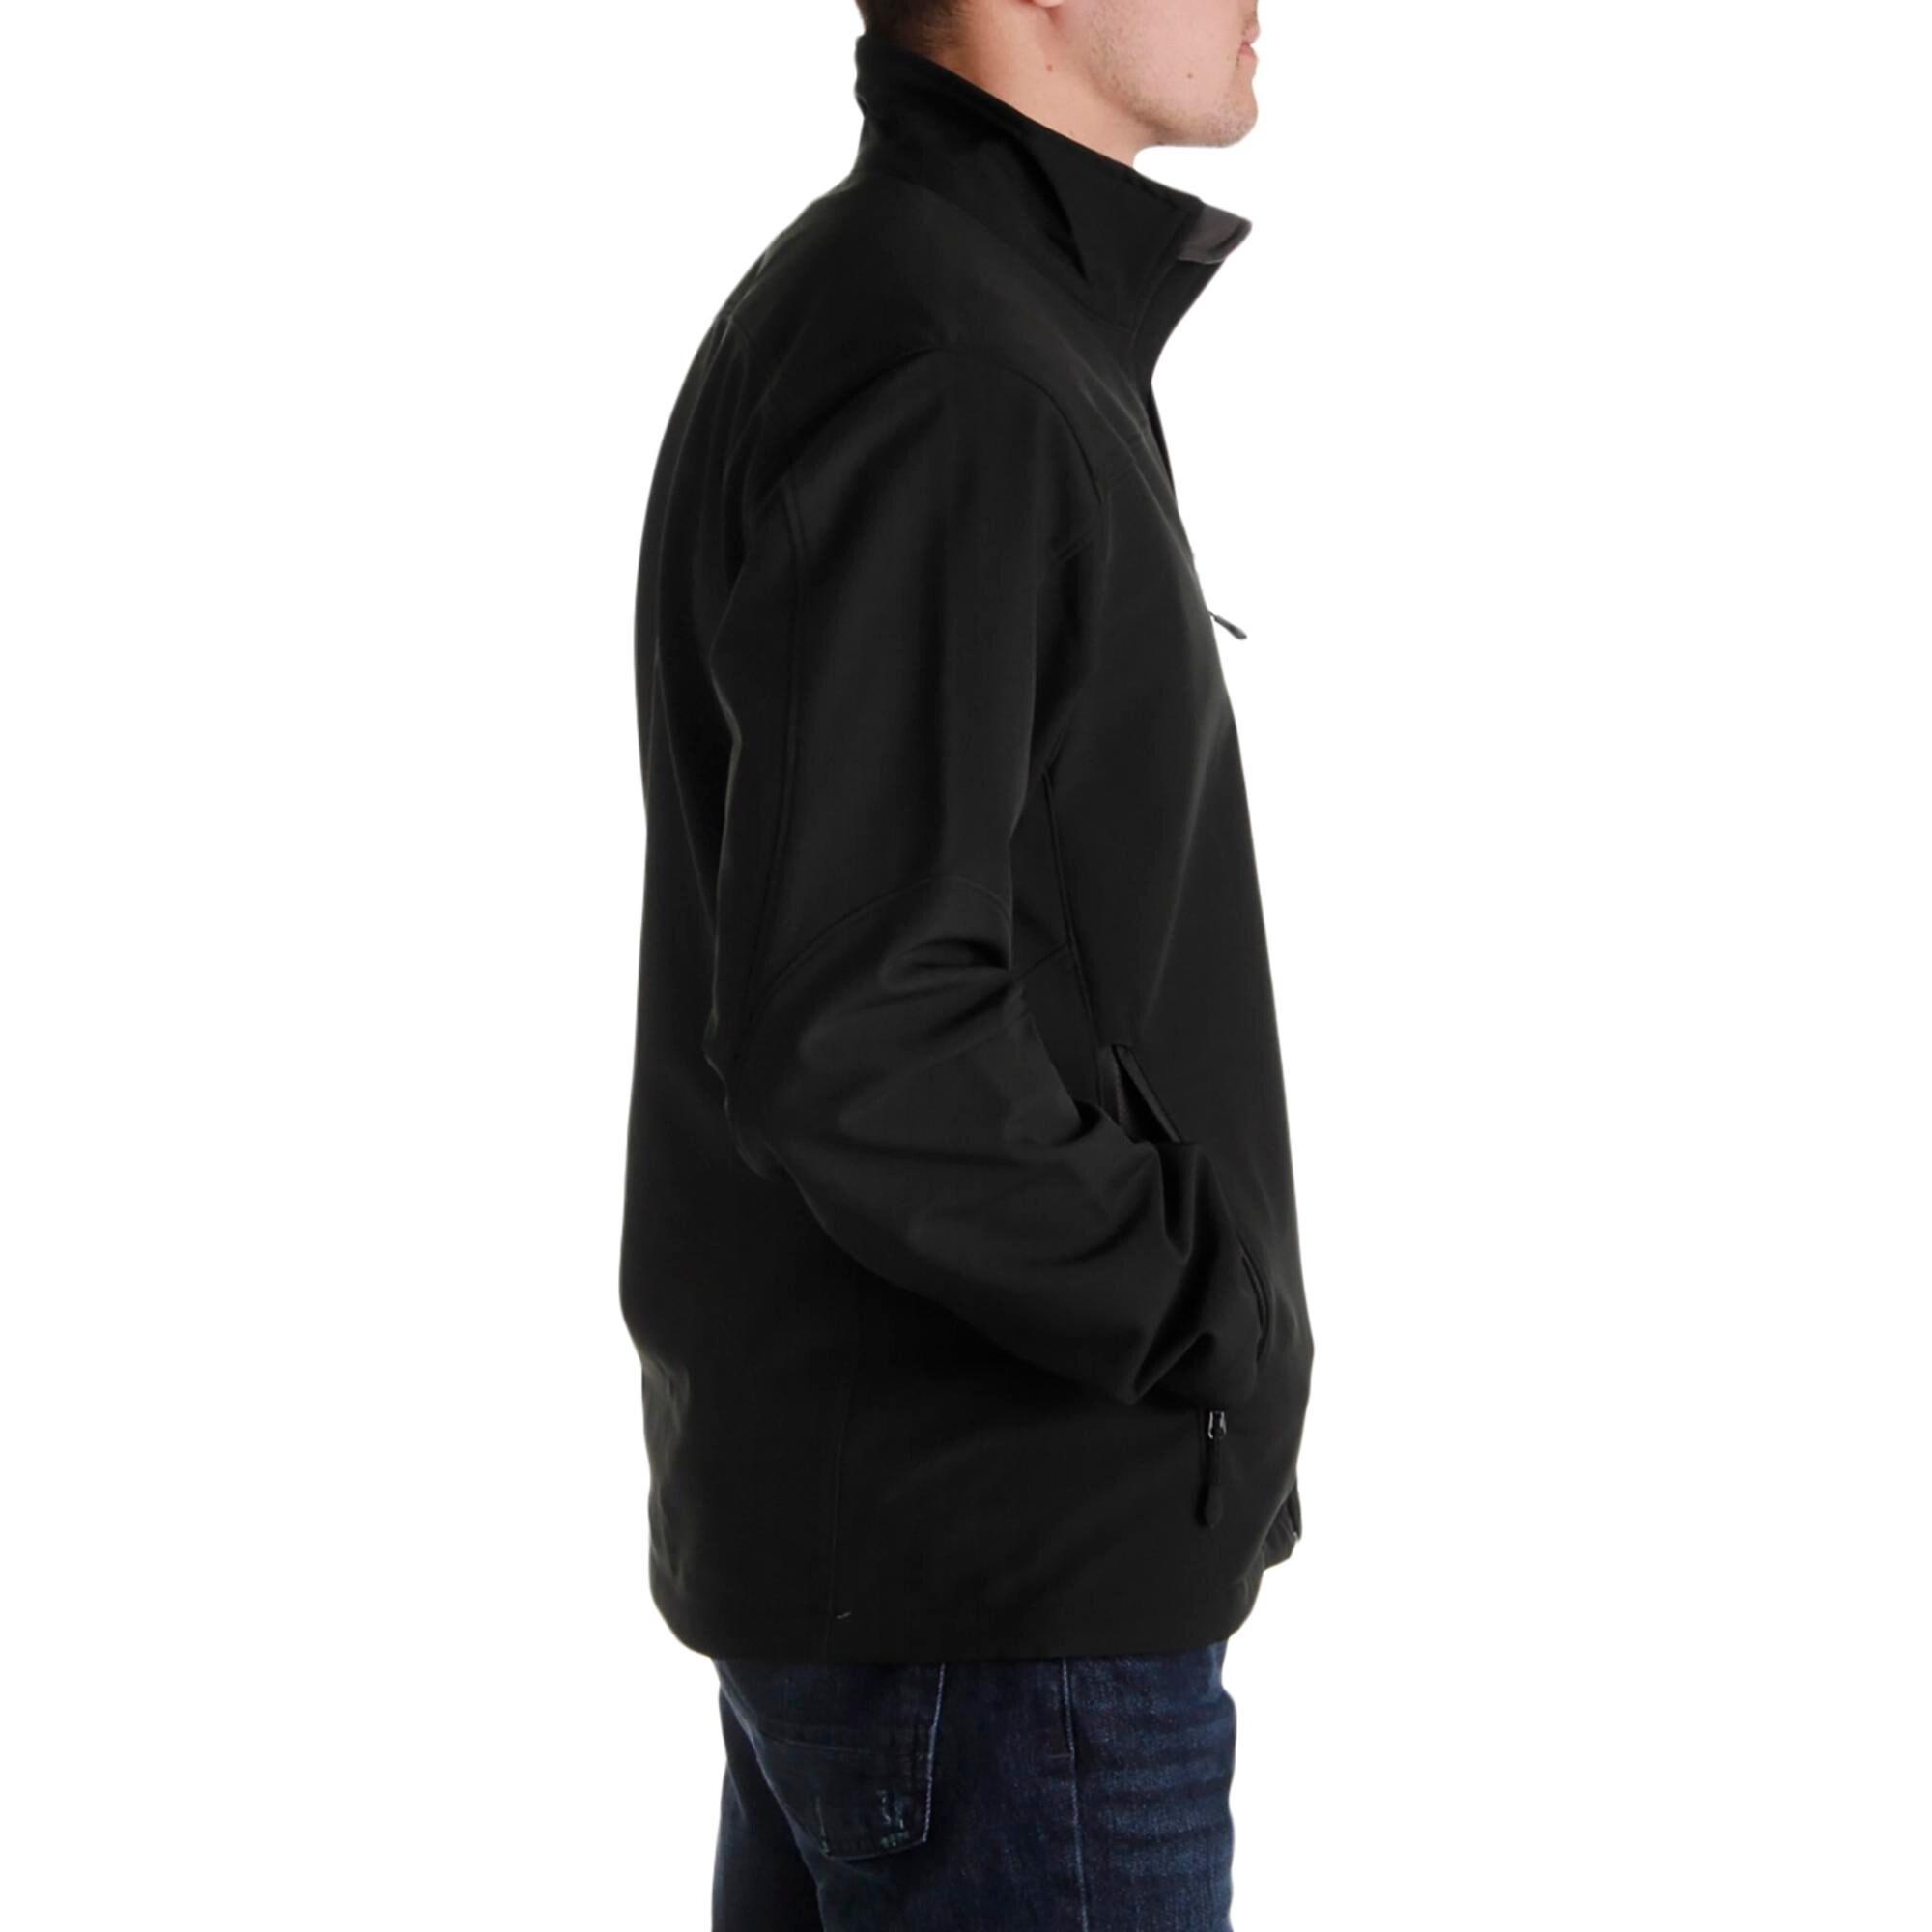 Tahari Men/'s Water Repellent Performance Soft Shell Jacket Coat